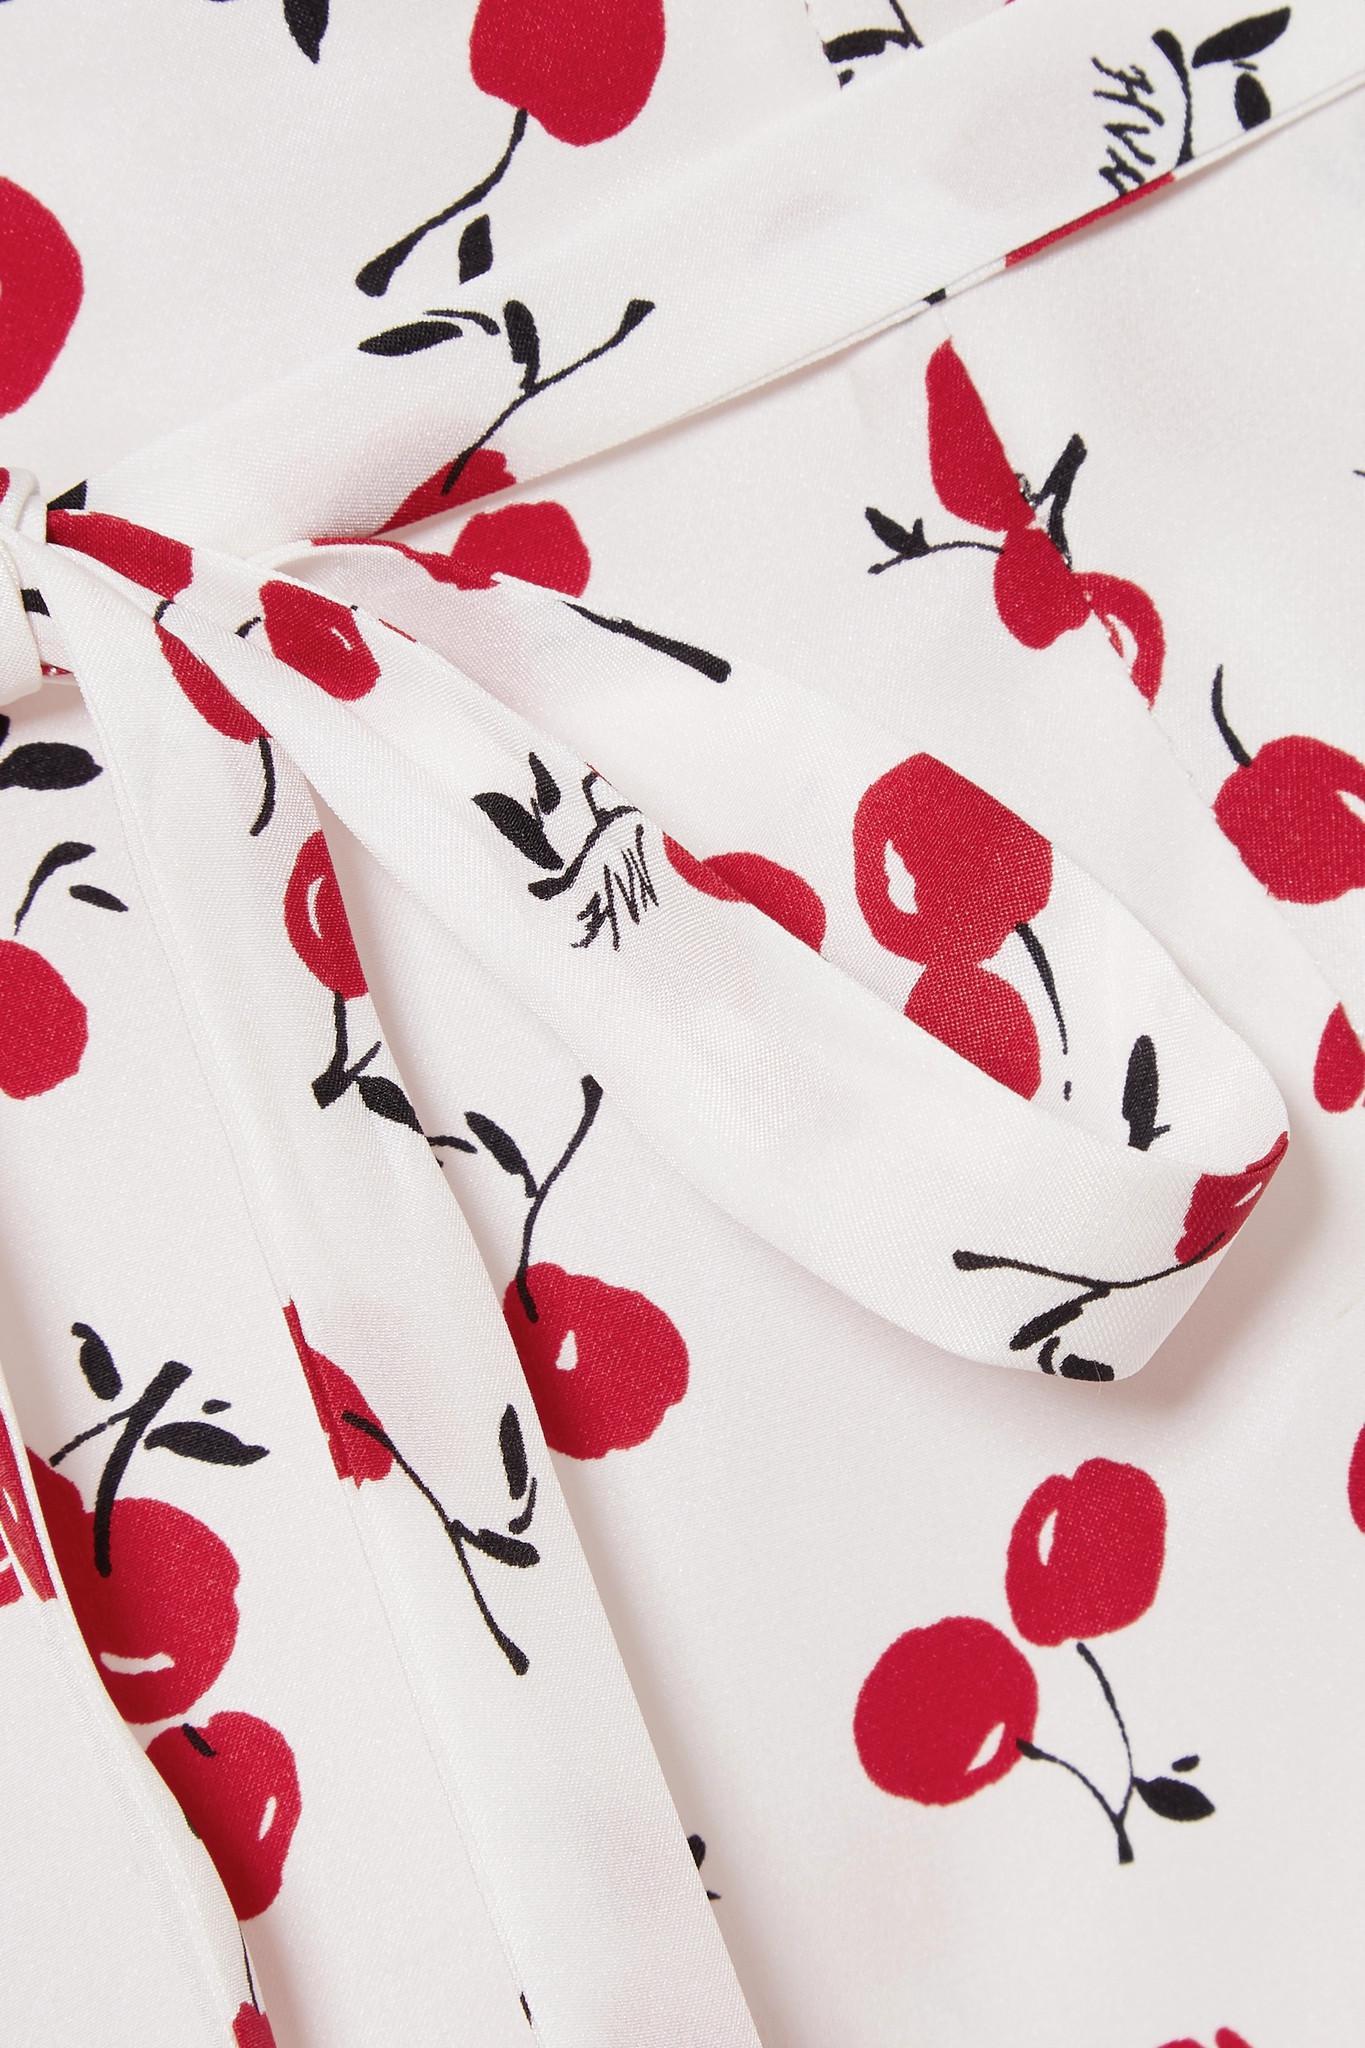 d6cd8c7b2898 HVN Lily Printed Silk Crepe De Chine Mini Dress in White - Lyst